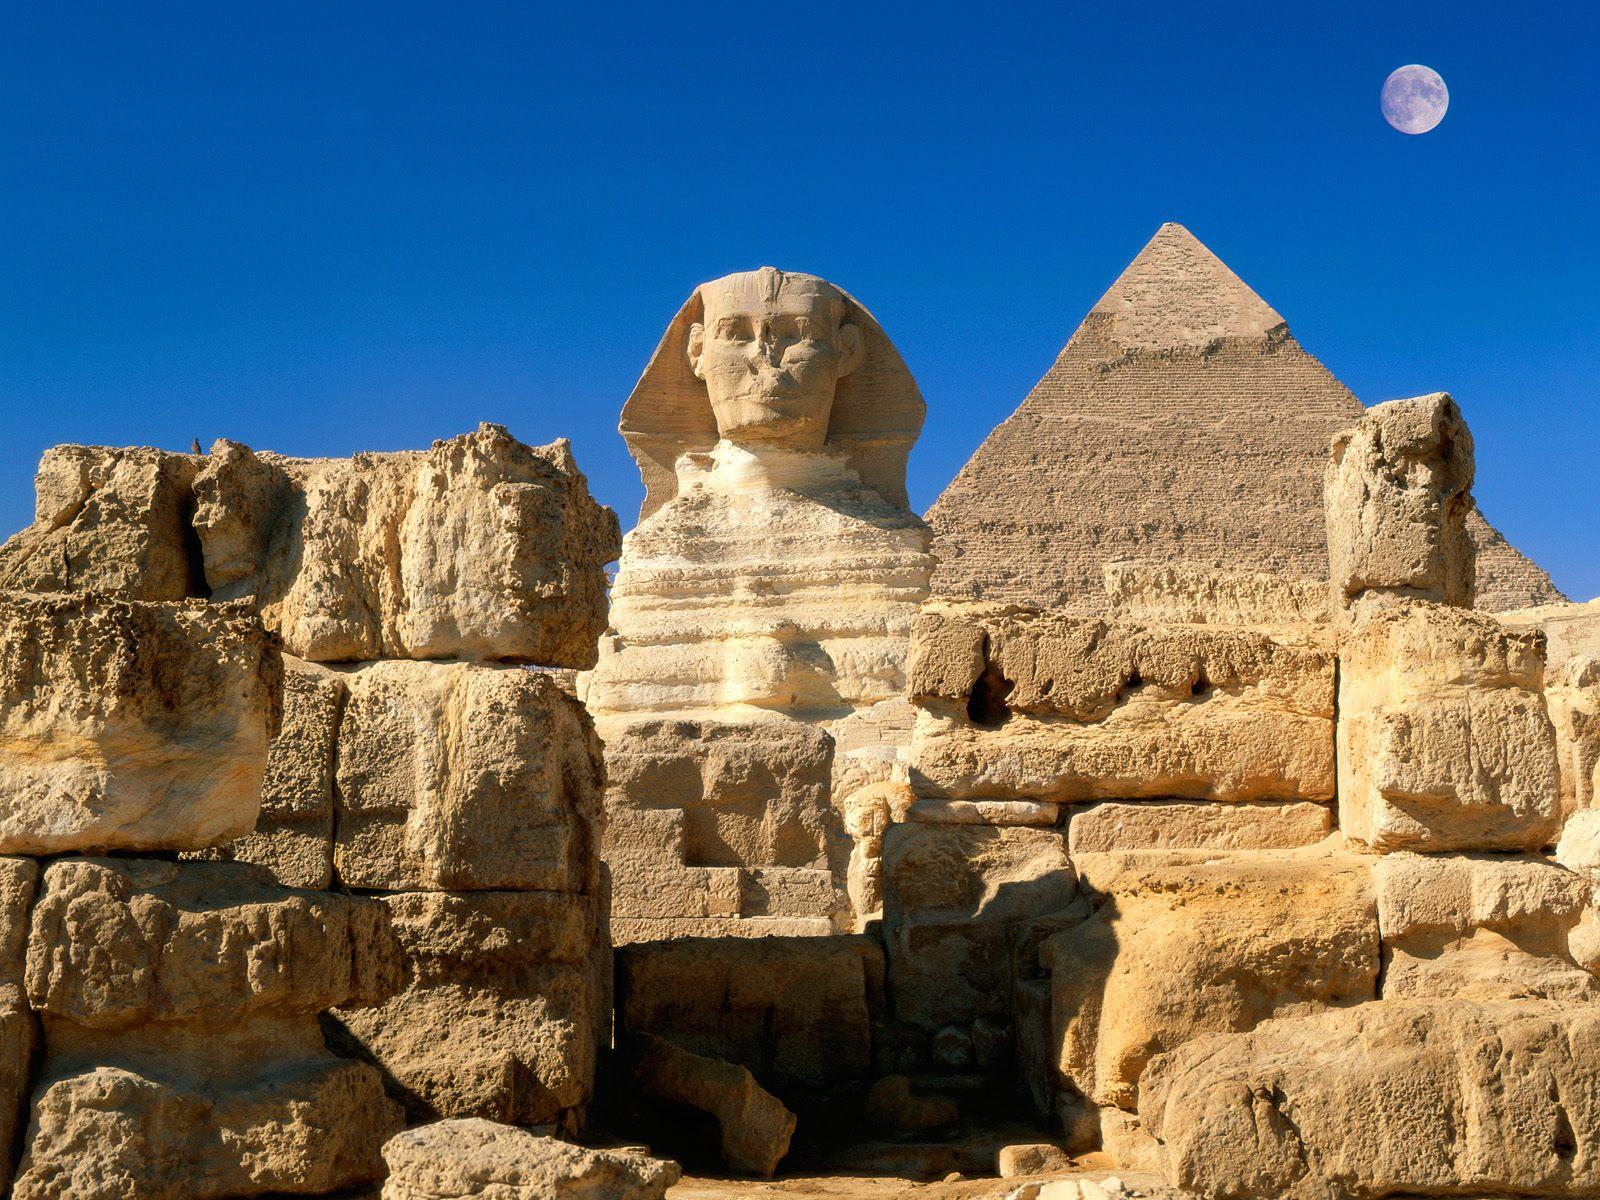 Kefren Piramidi, Pyramid of Chephren, pyramid, Chepren, Chephren, Khafre, Kafre, Mısır, Ancient Egypt